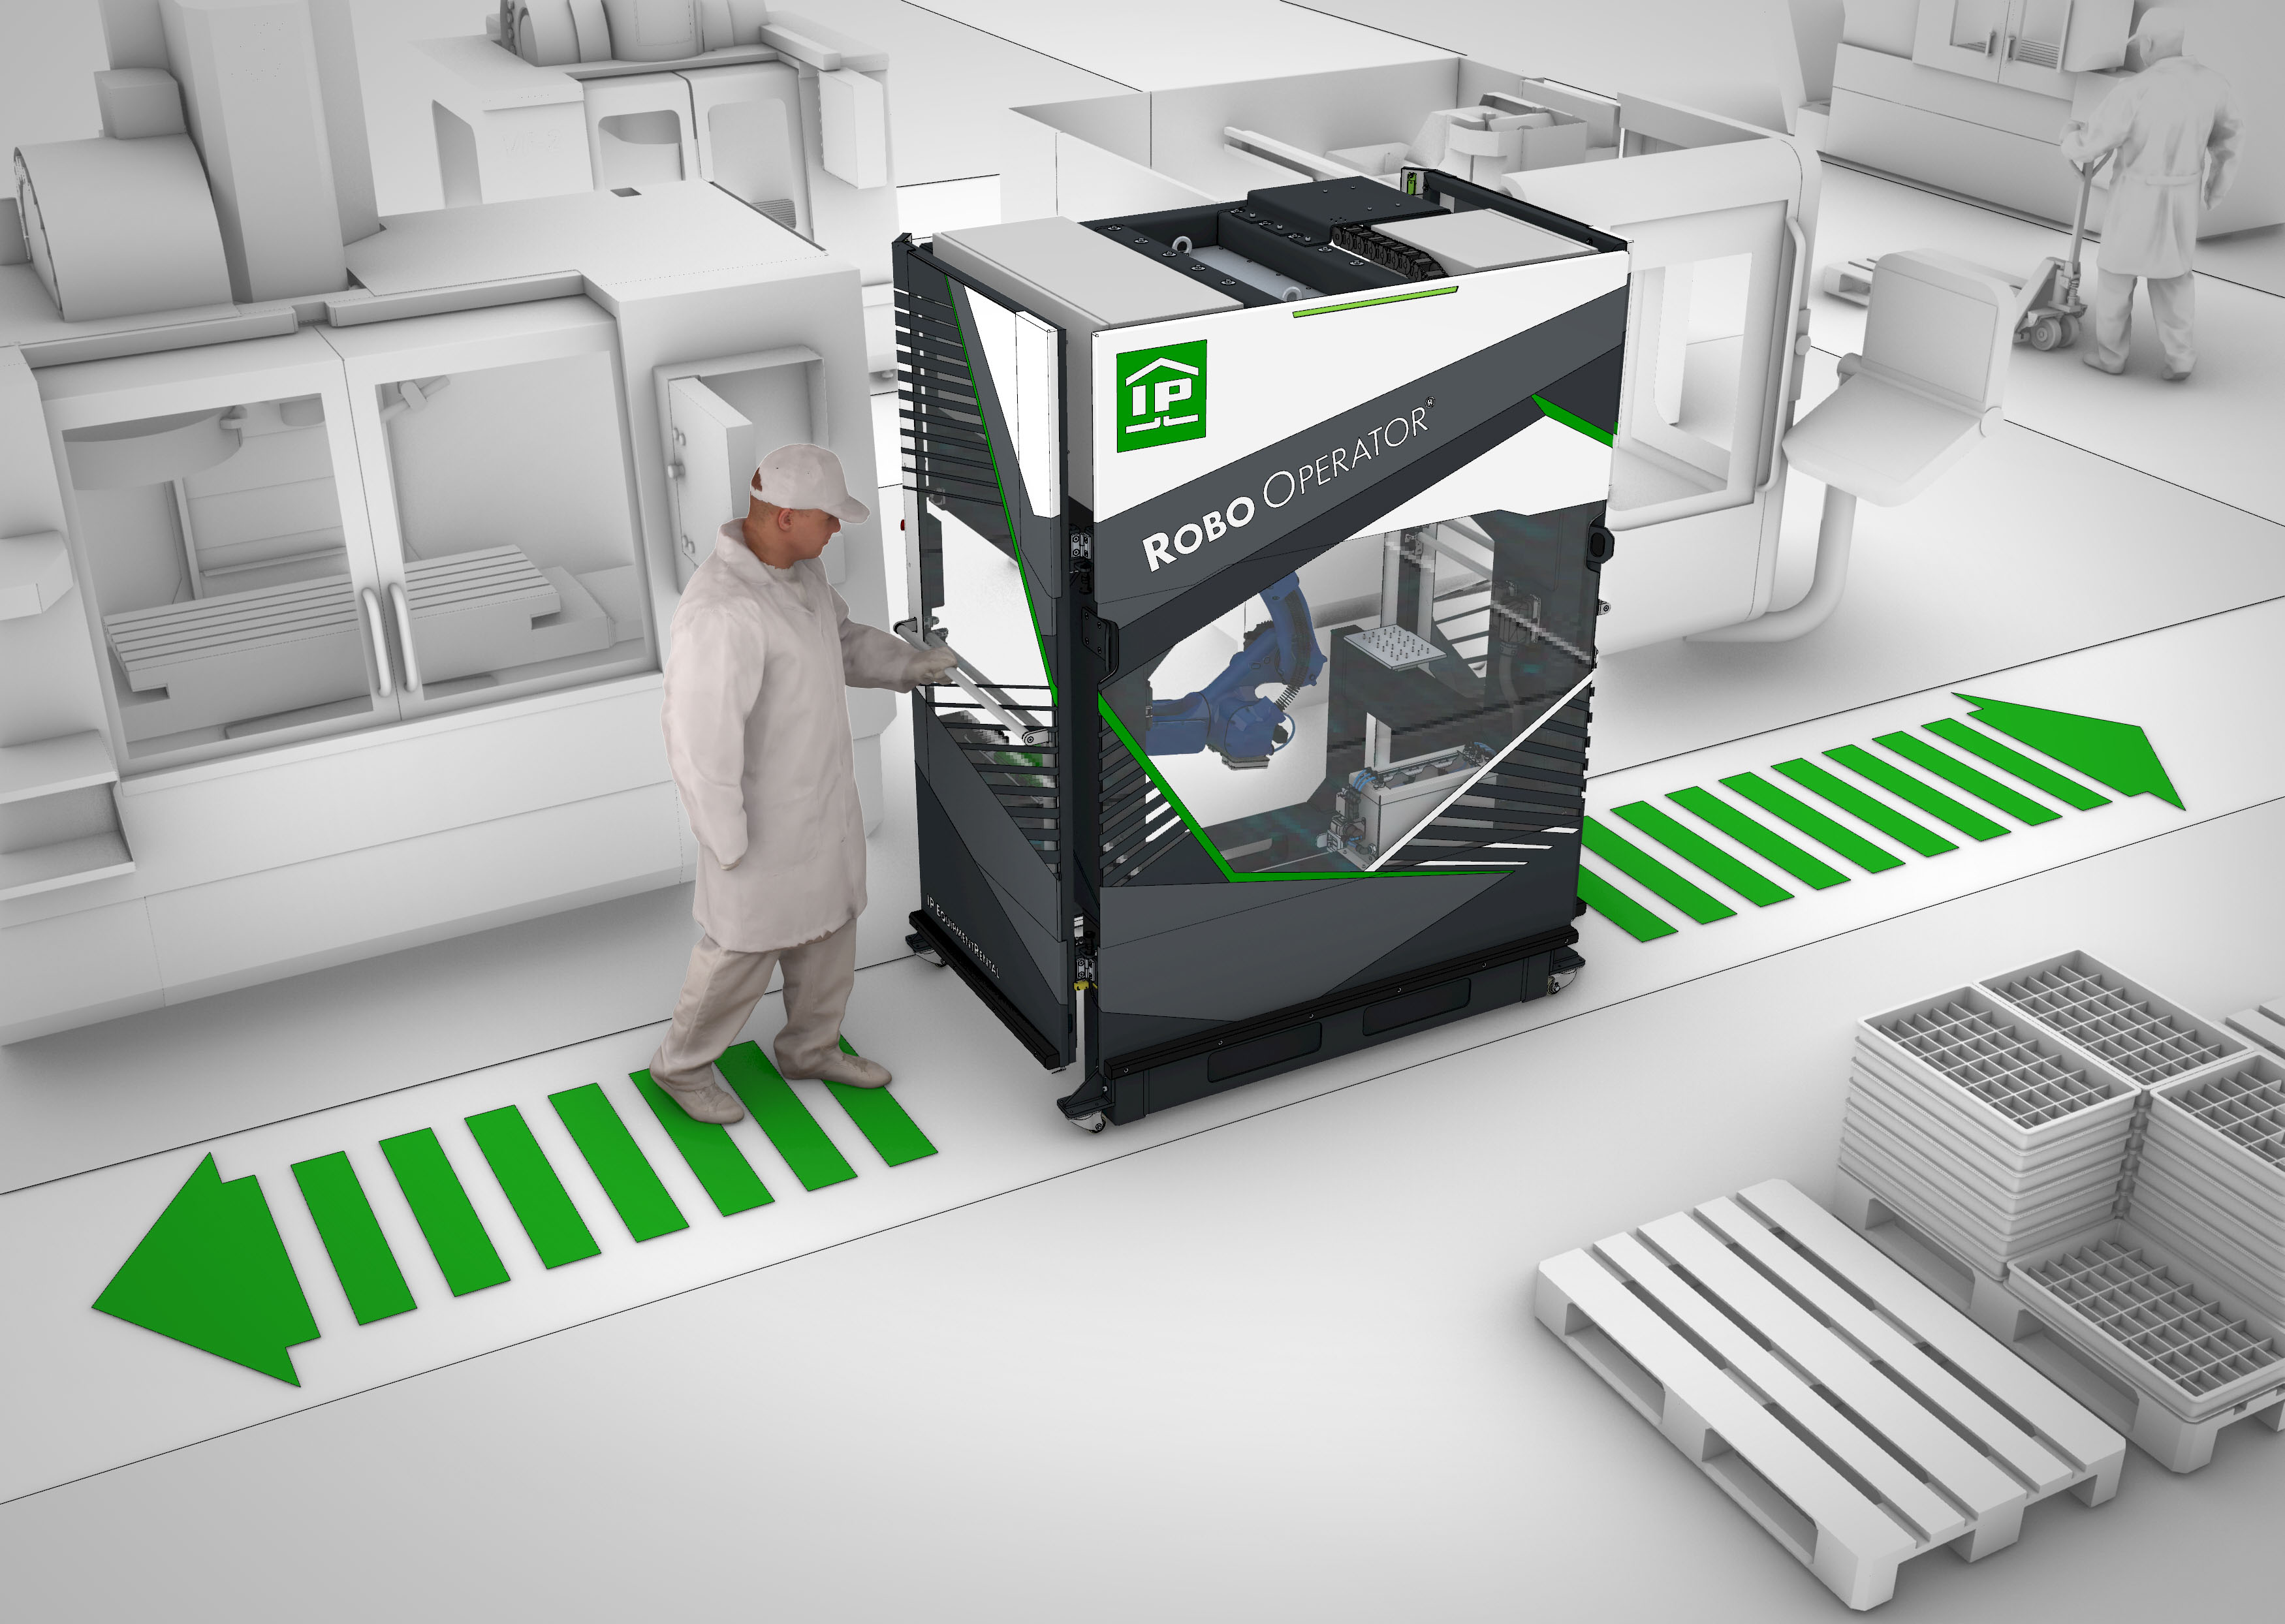 Robo Operator